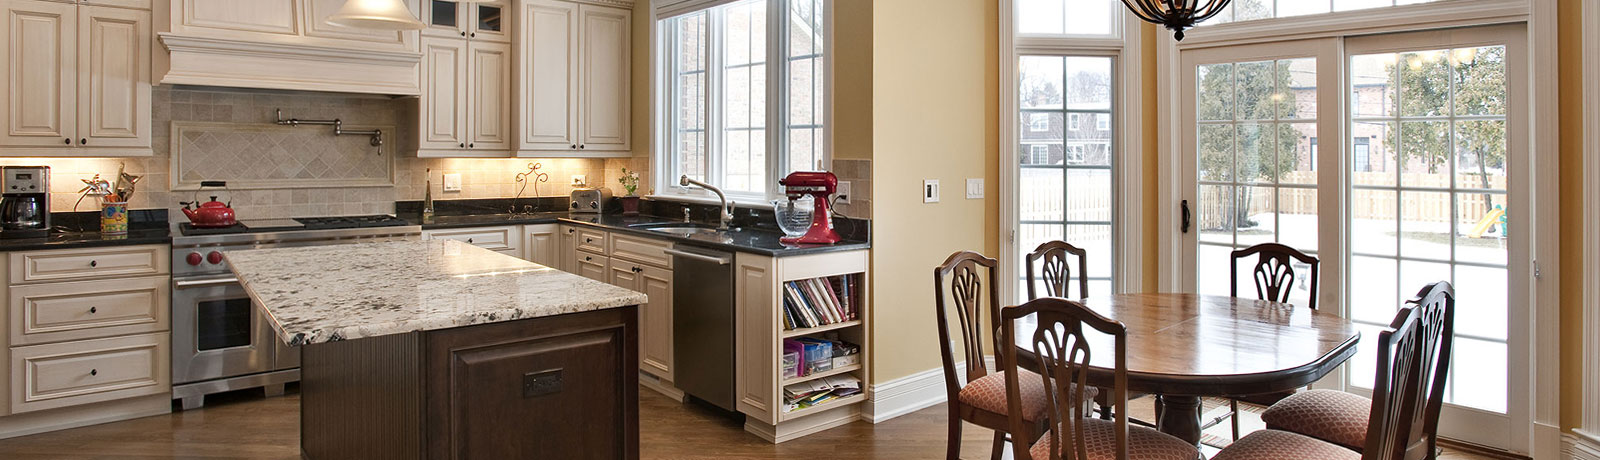 Liquidation kitchen cabinets canada cabinets matttroy for Bathroom vanities lakewood nj